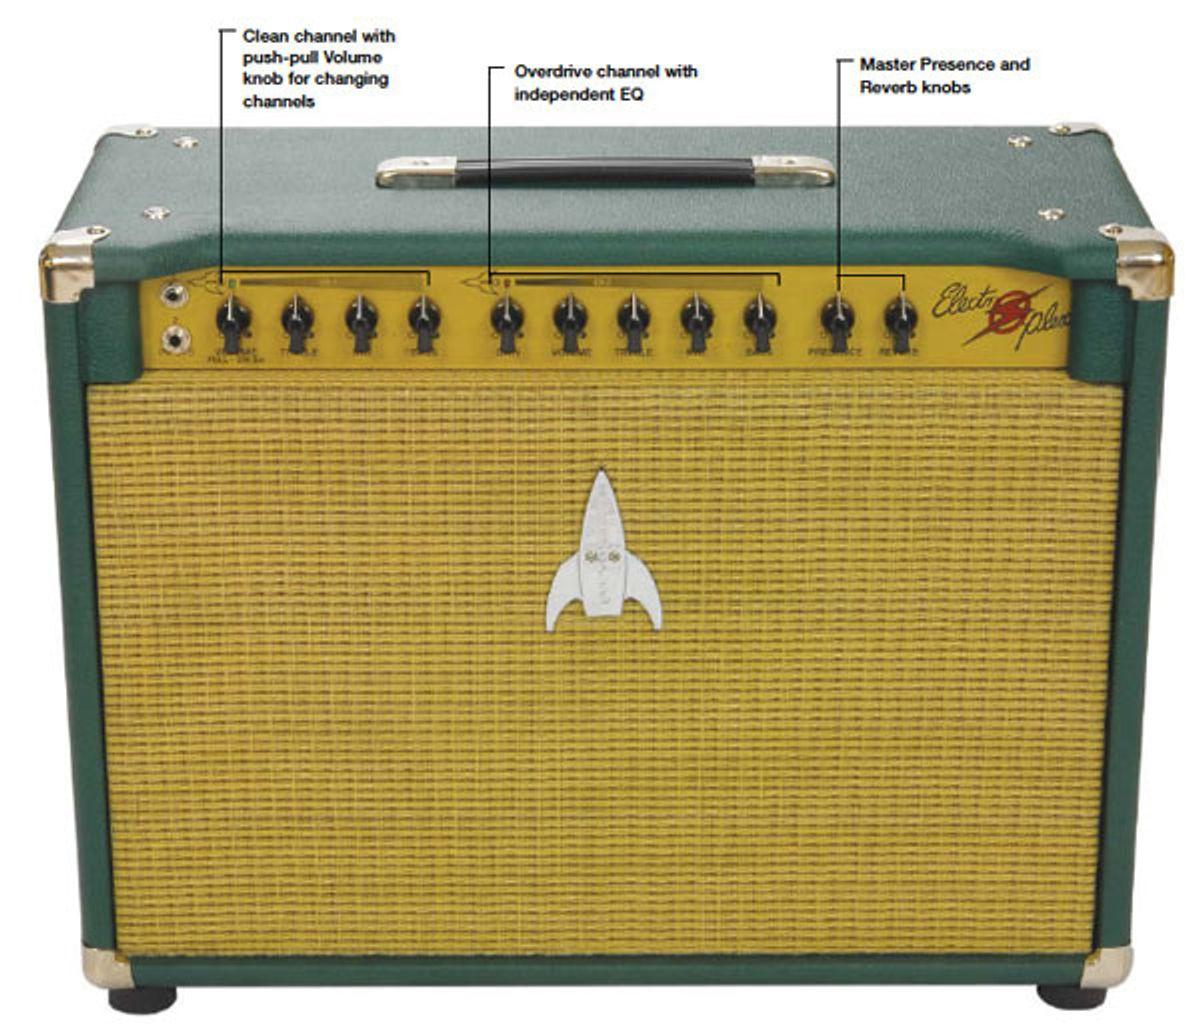 Electroplex Rocket 22 Amp Review